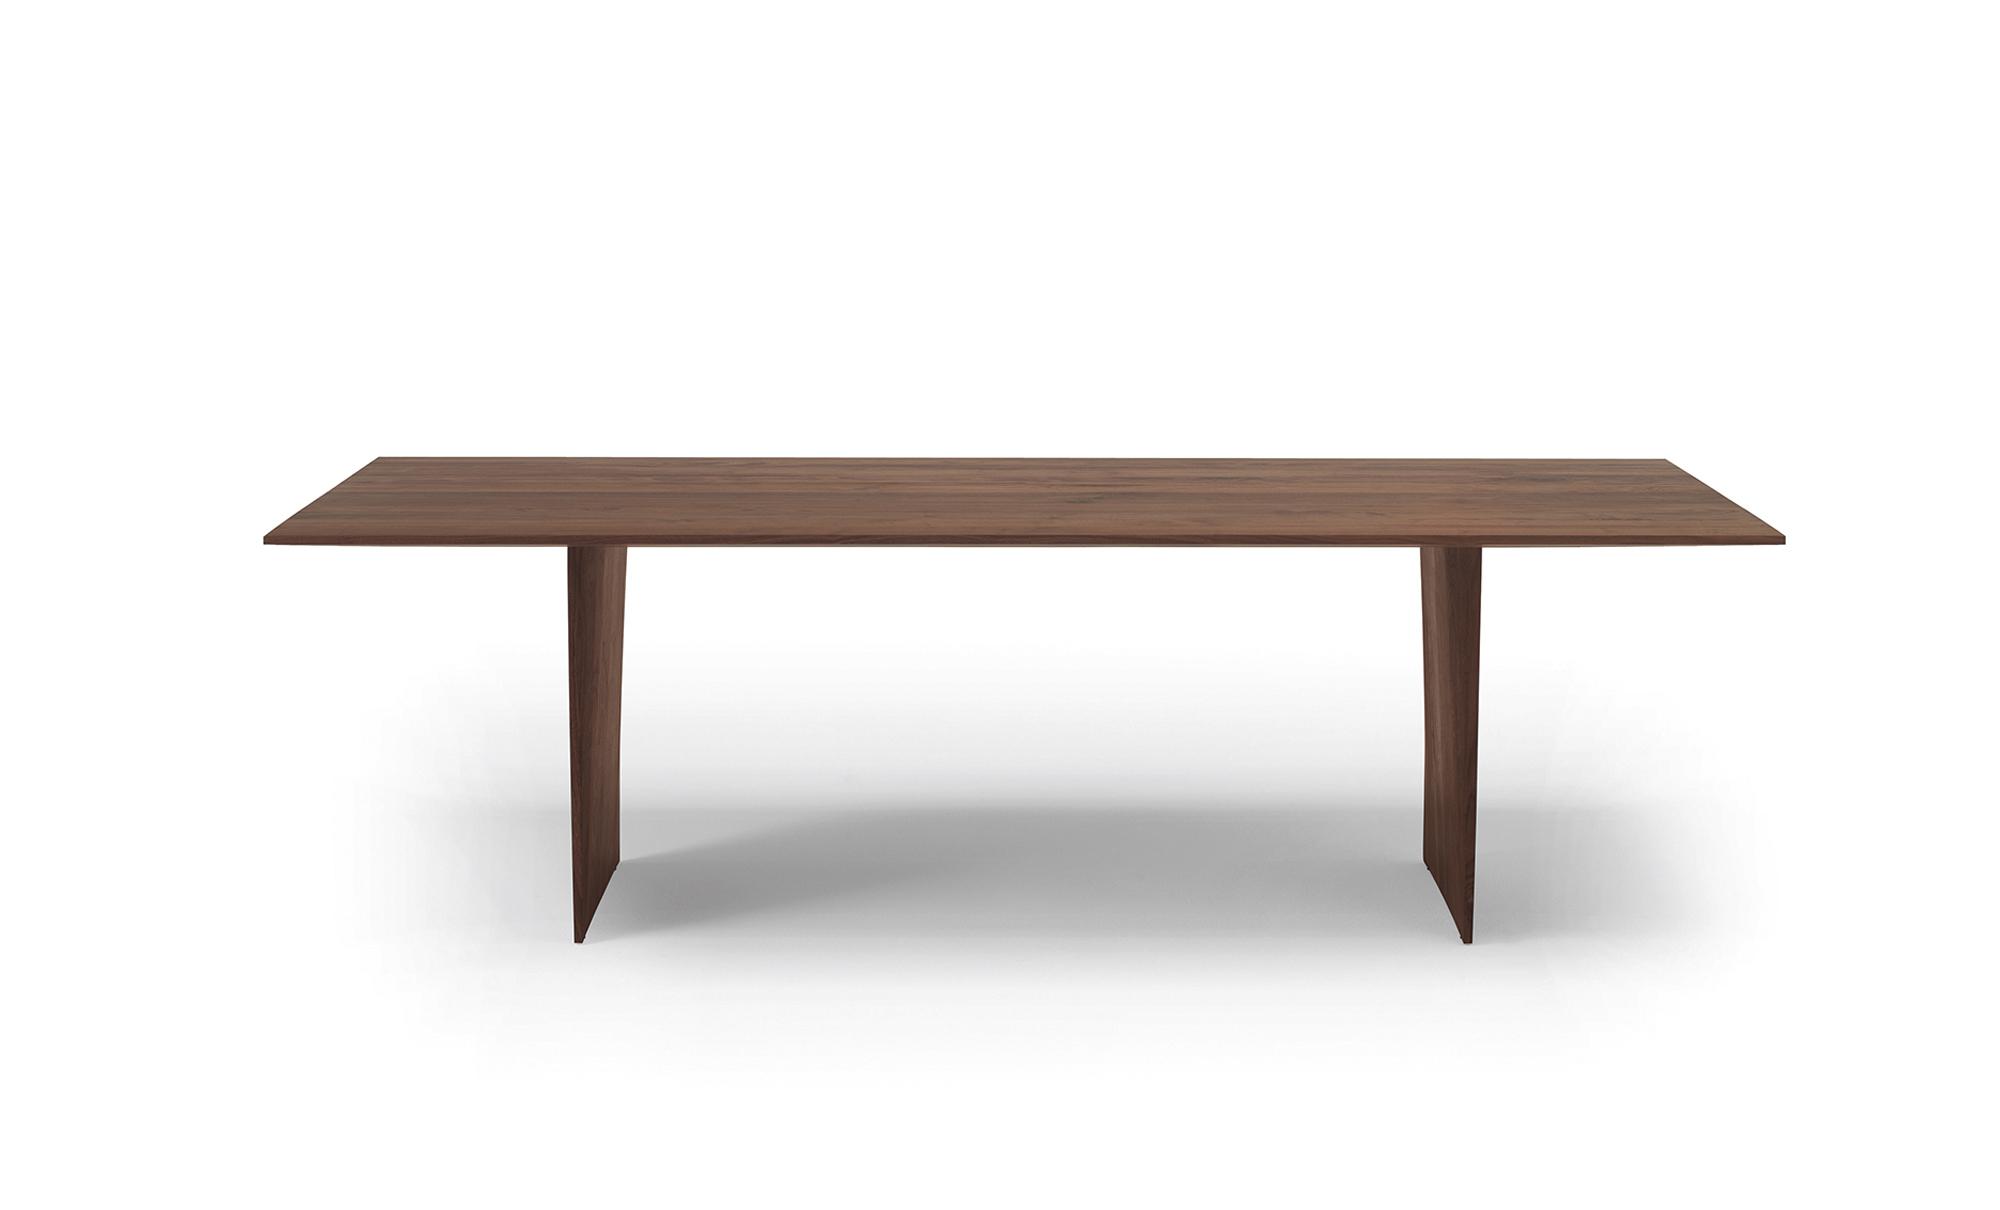 Light Dining Tables Fanuli Furniture Table Lighting